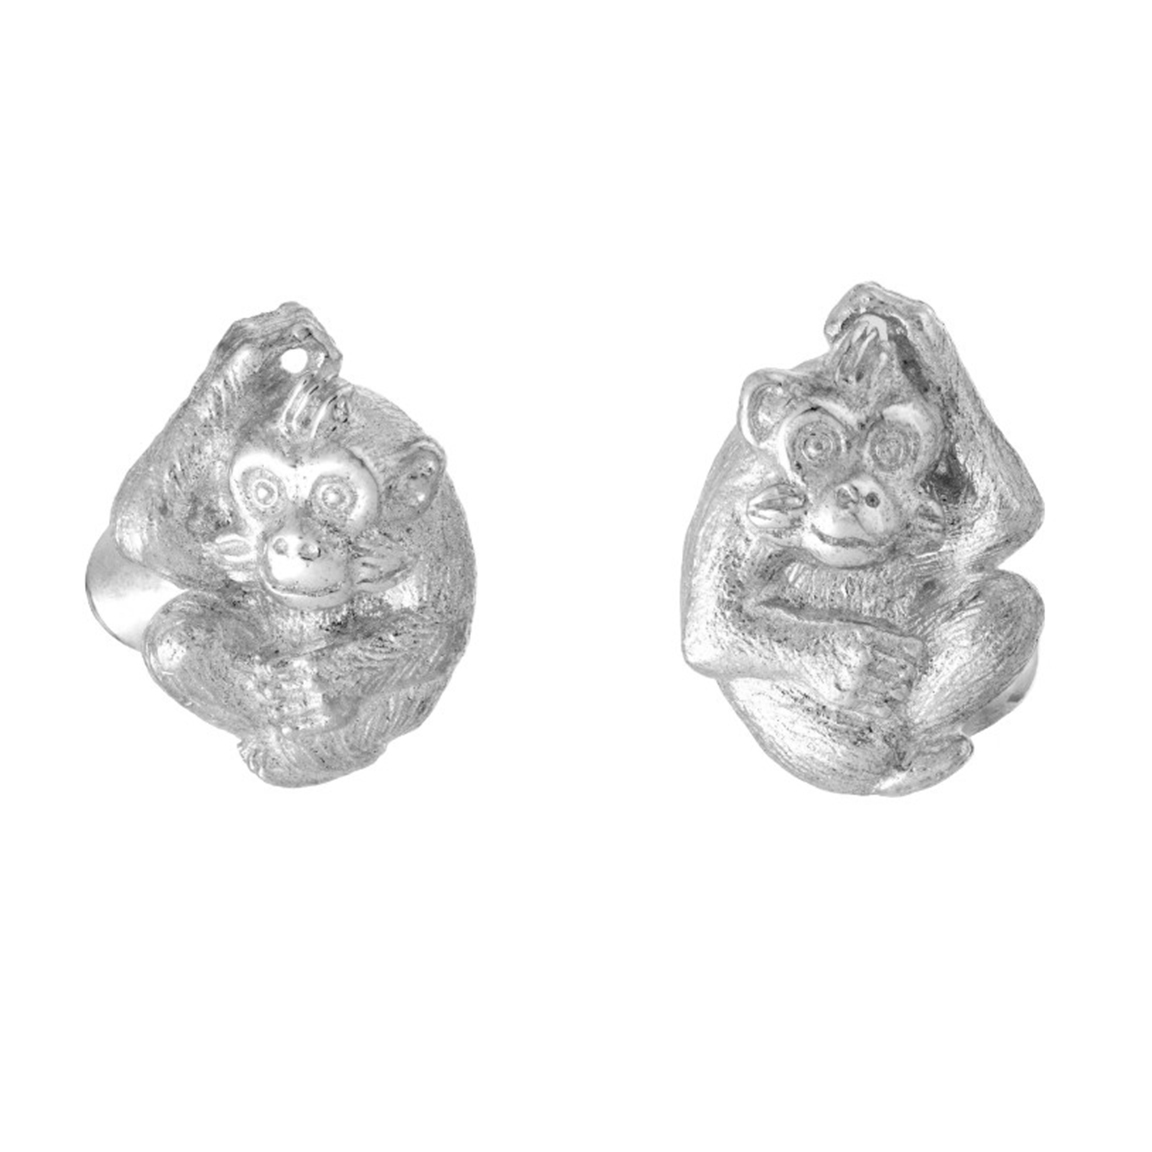 Zodiac East Monkey Cufflink